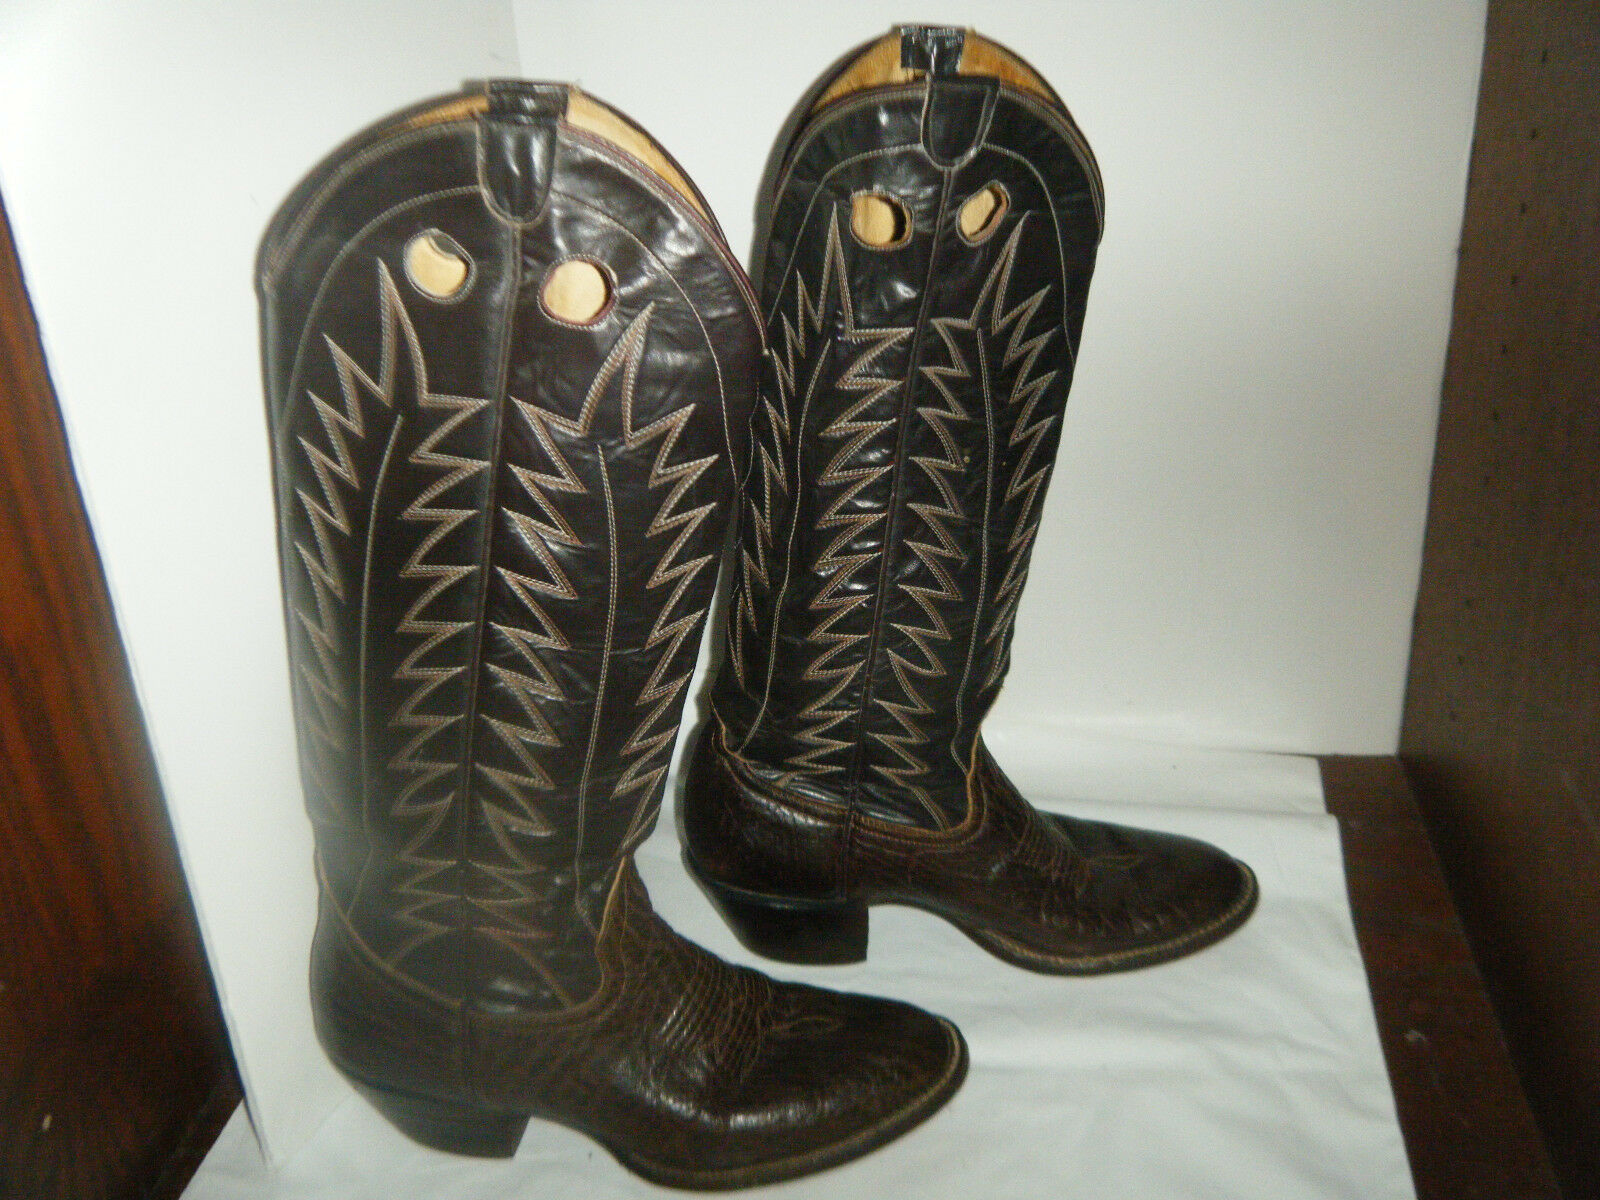 Vintage  Cowboy  Brown Stivali Size  7.5 D Uomo Used